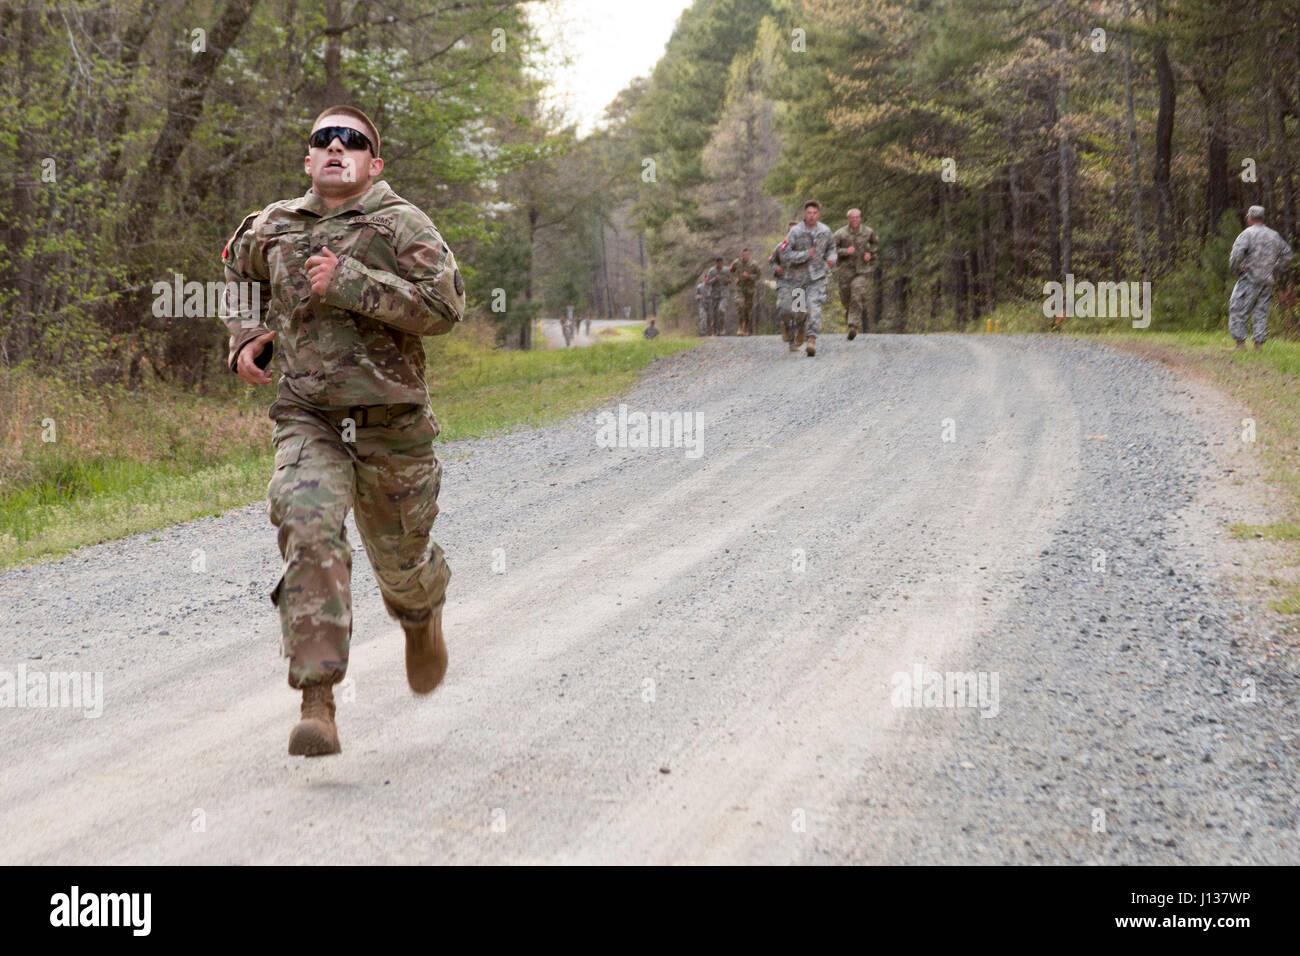 Wunderbar Uns Armee Reserve Fortsetzen Fotos - Entry Level Resume ...